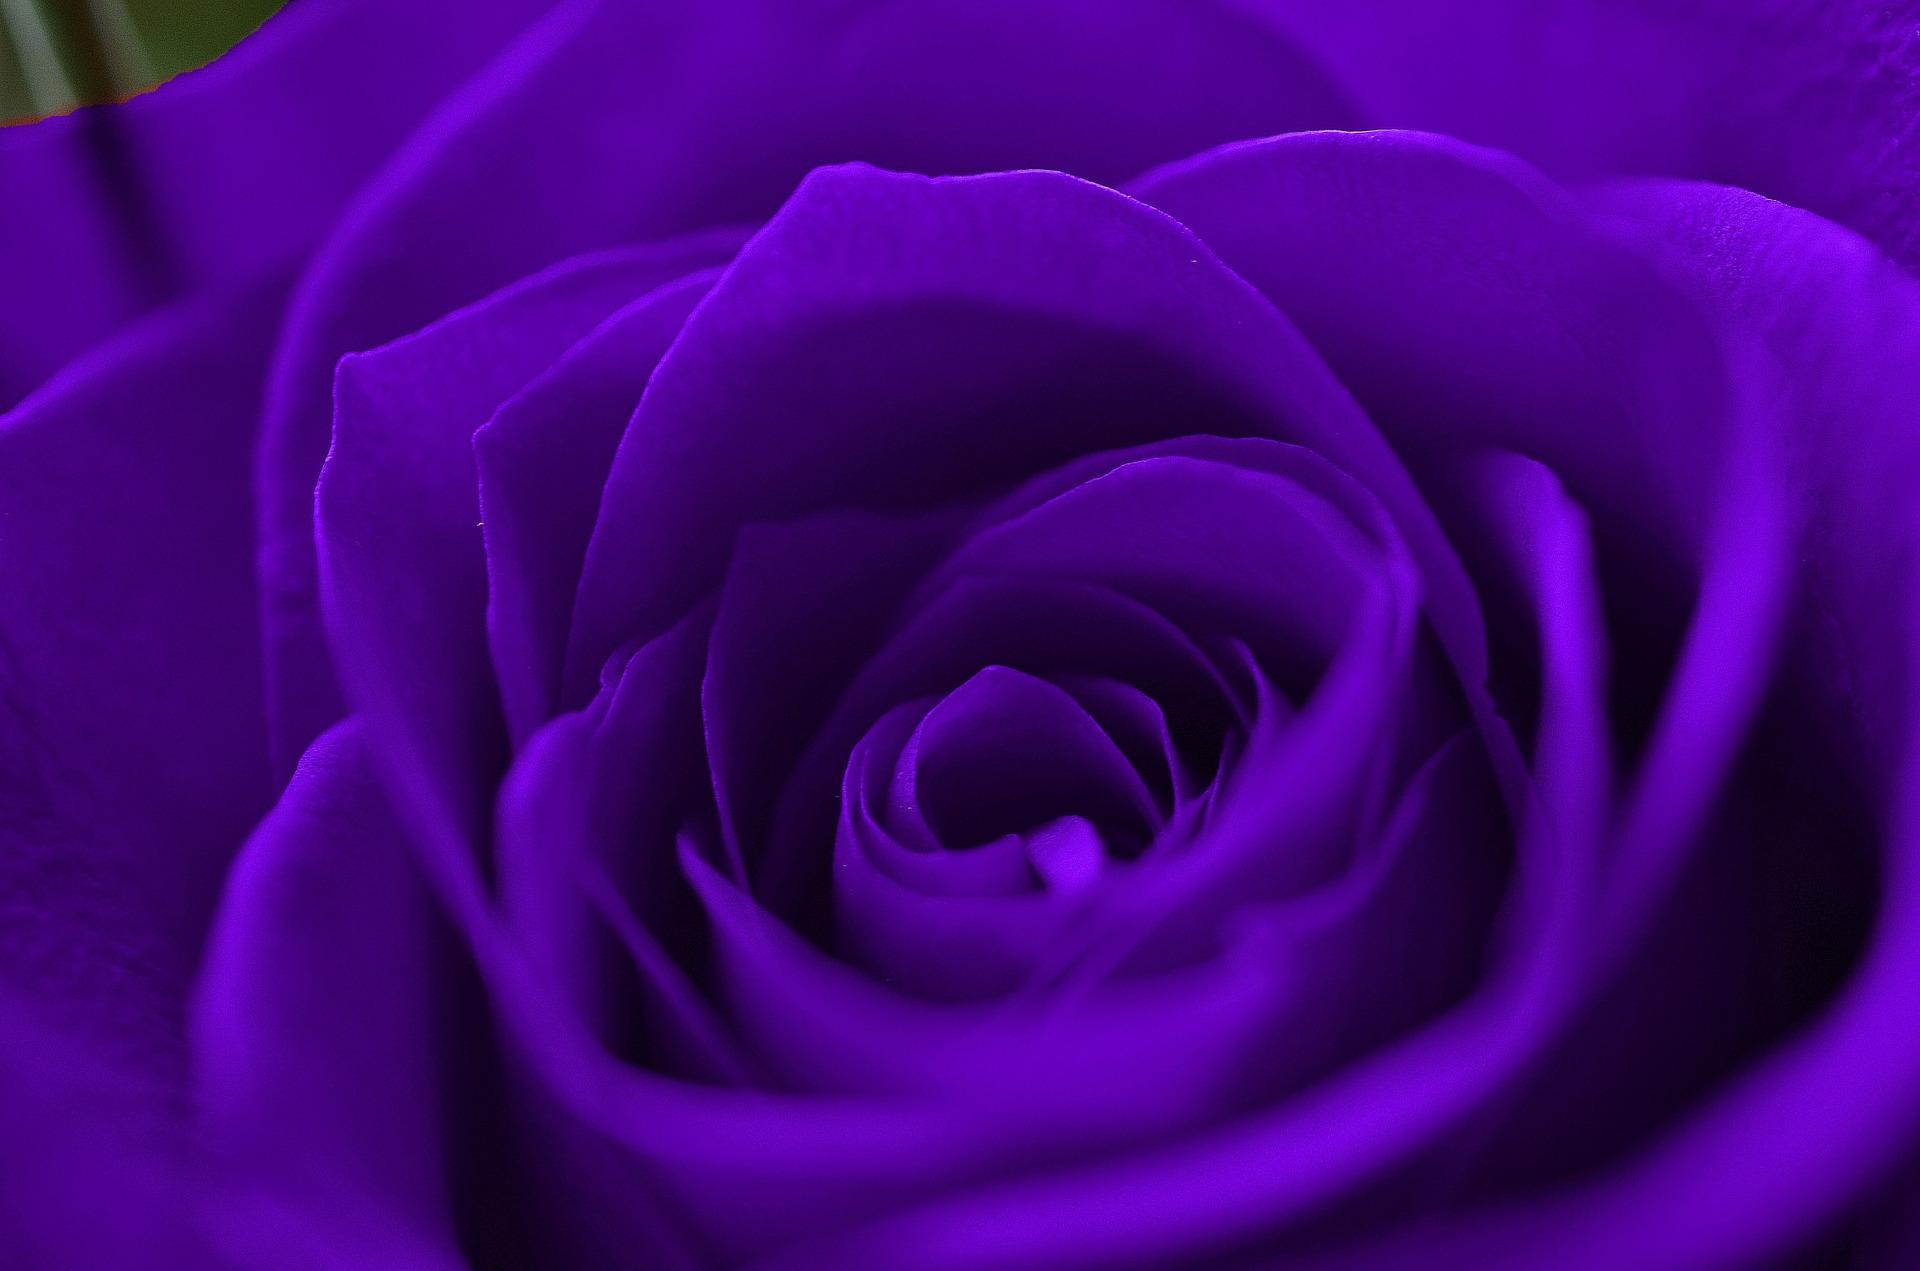 HD Wallpapers 1080p Purple Rose 1920x1271